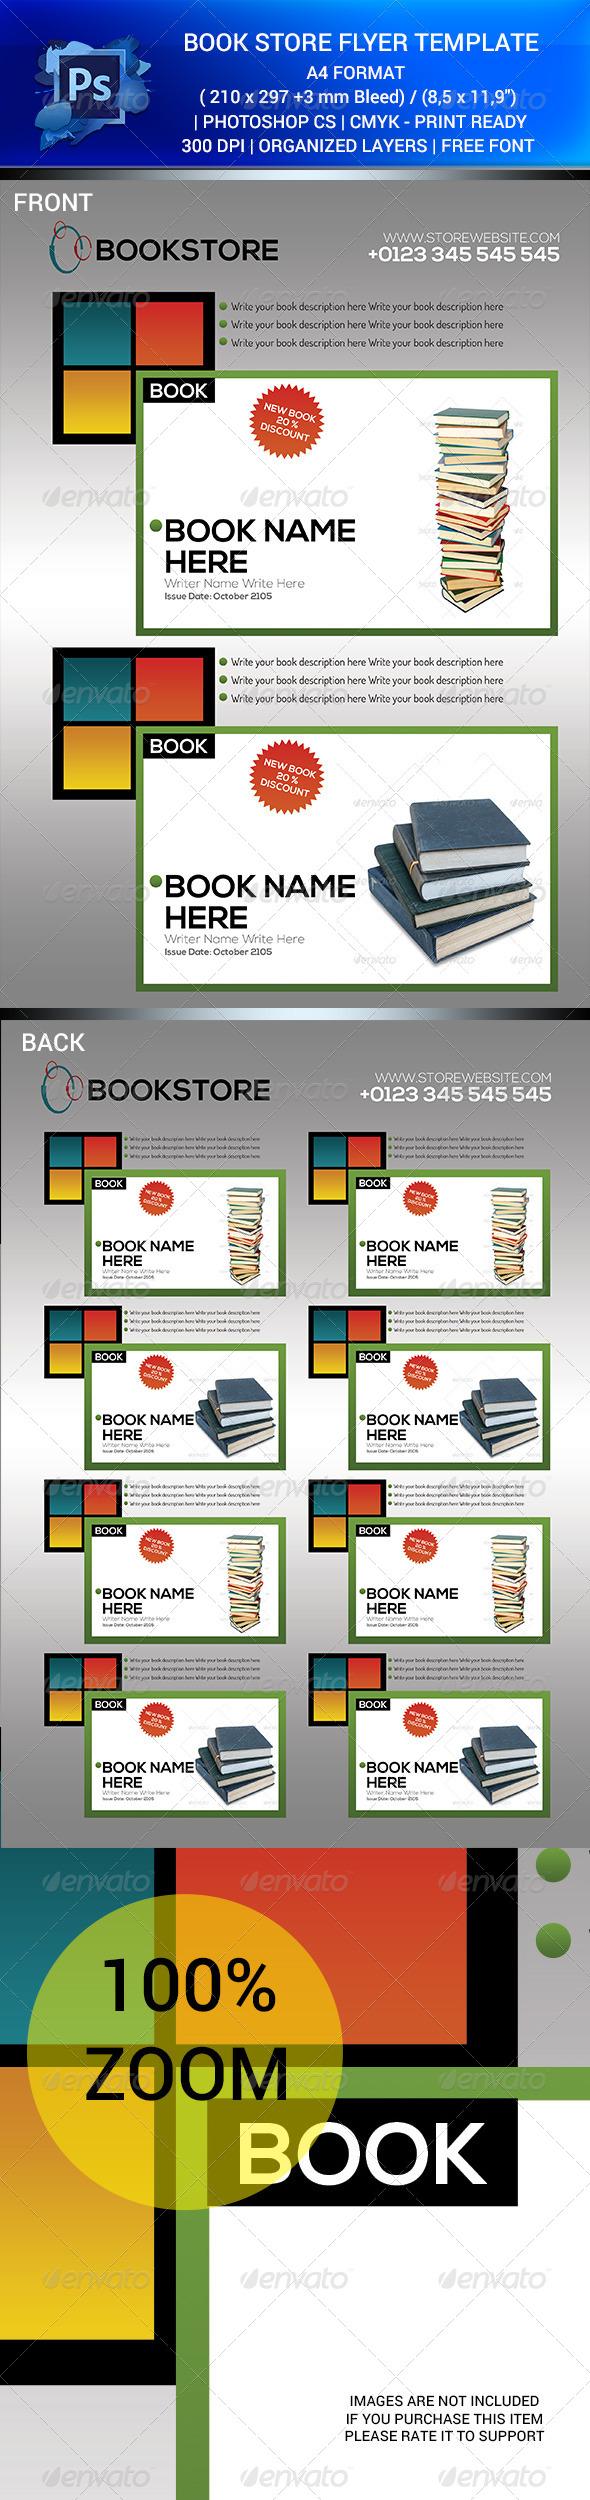 BOOK STORE SALES FLYER TEMPALET V.1 PSD - Flyers Print Templates